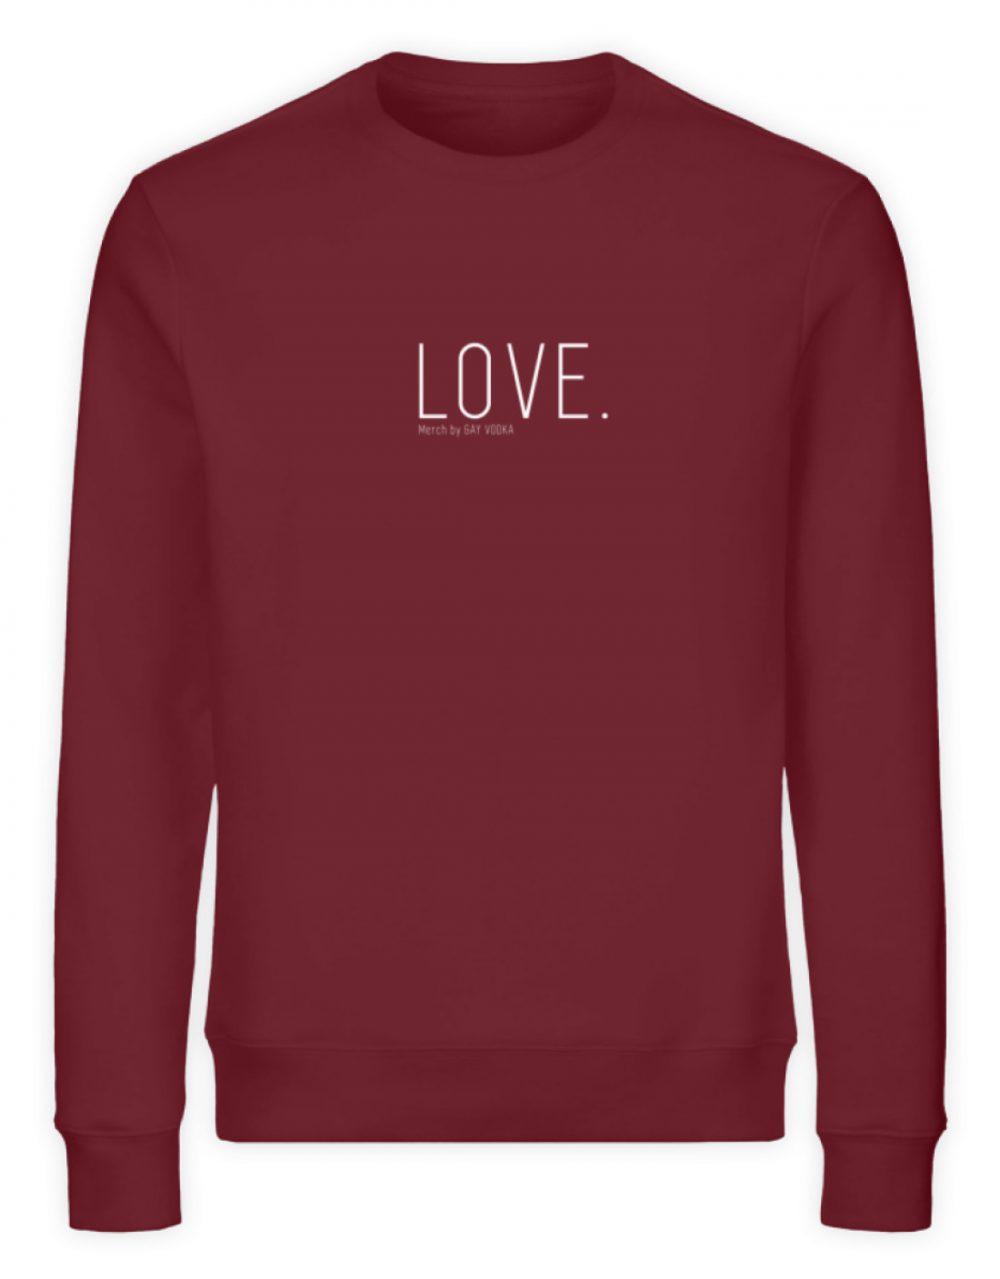 LOVE. - Unisex Organic Sweatshirt-6883